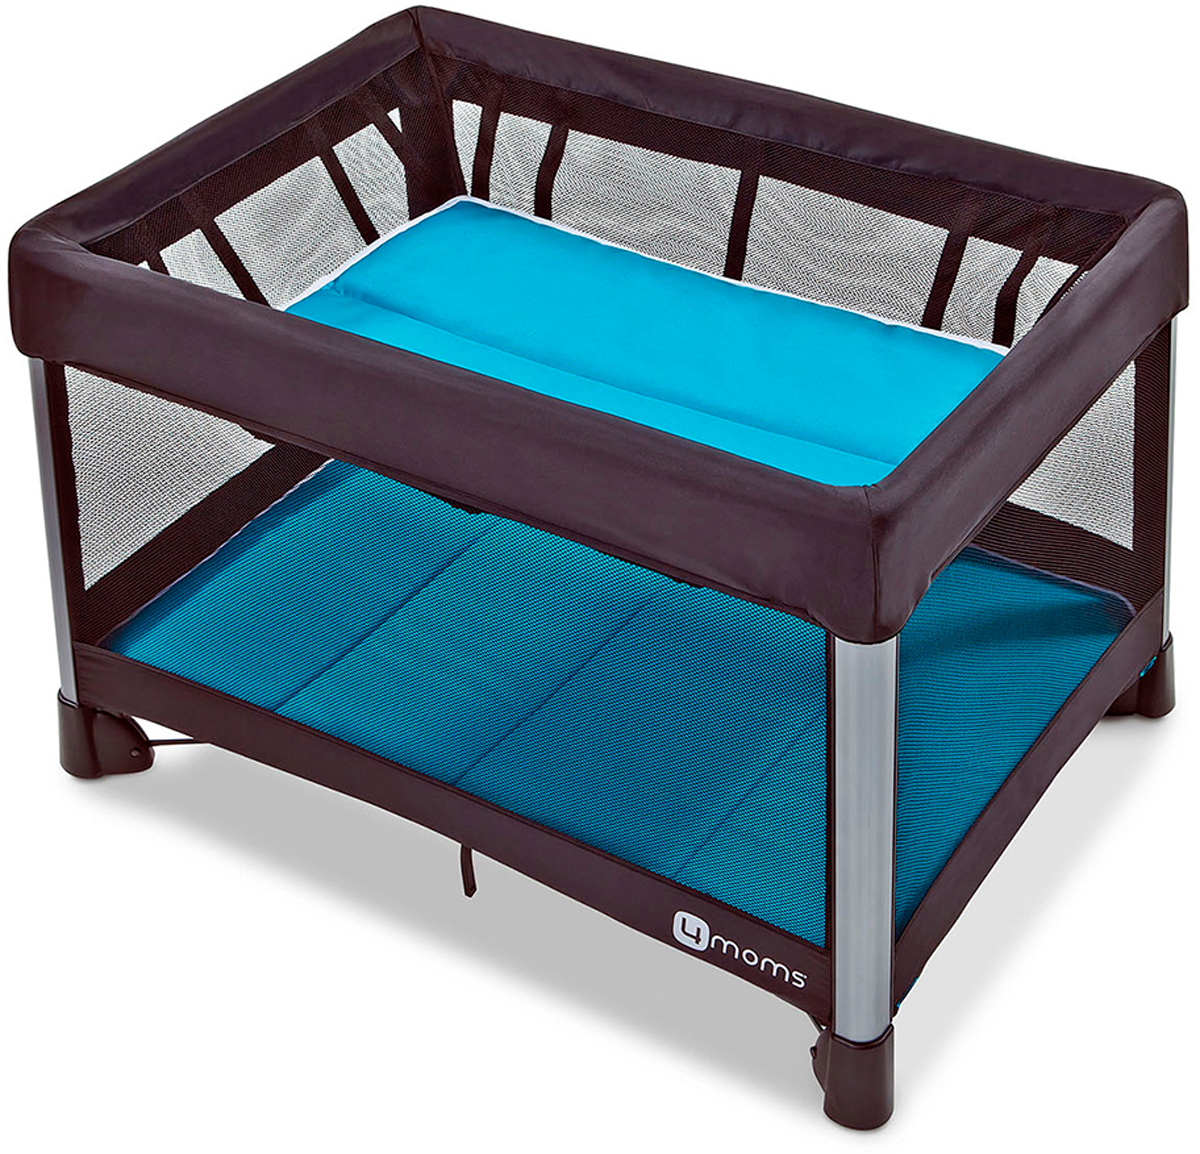 4moms Манеж-кроватка Breeze 2 цвет голубой 4moms электронное mamaroo 3 0 серый плюш